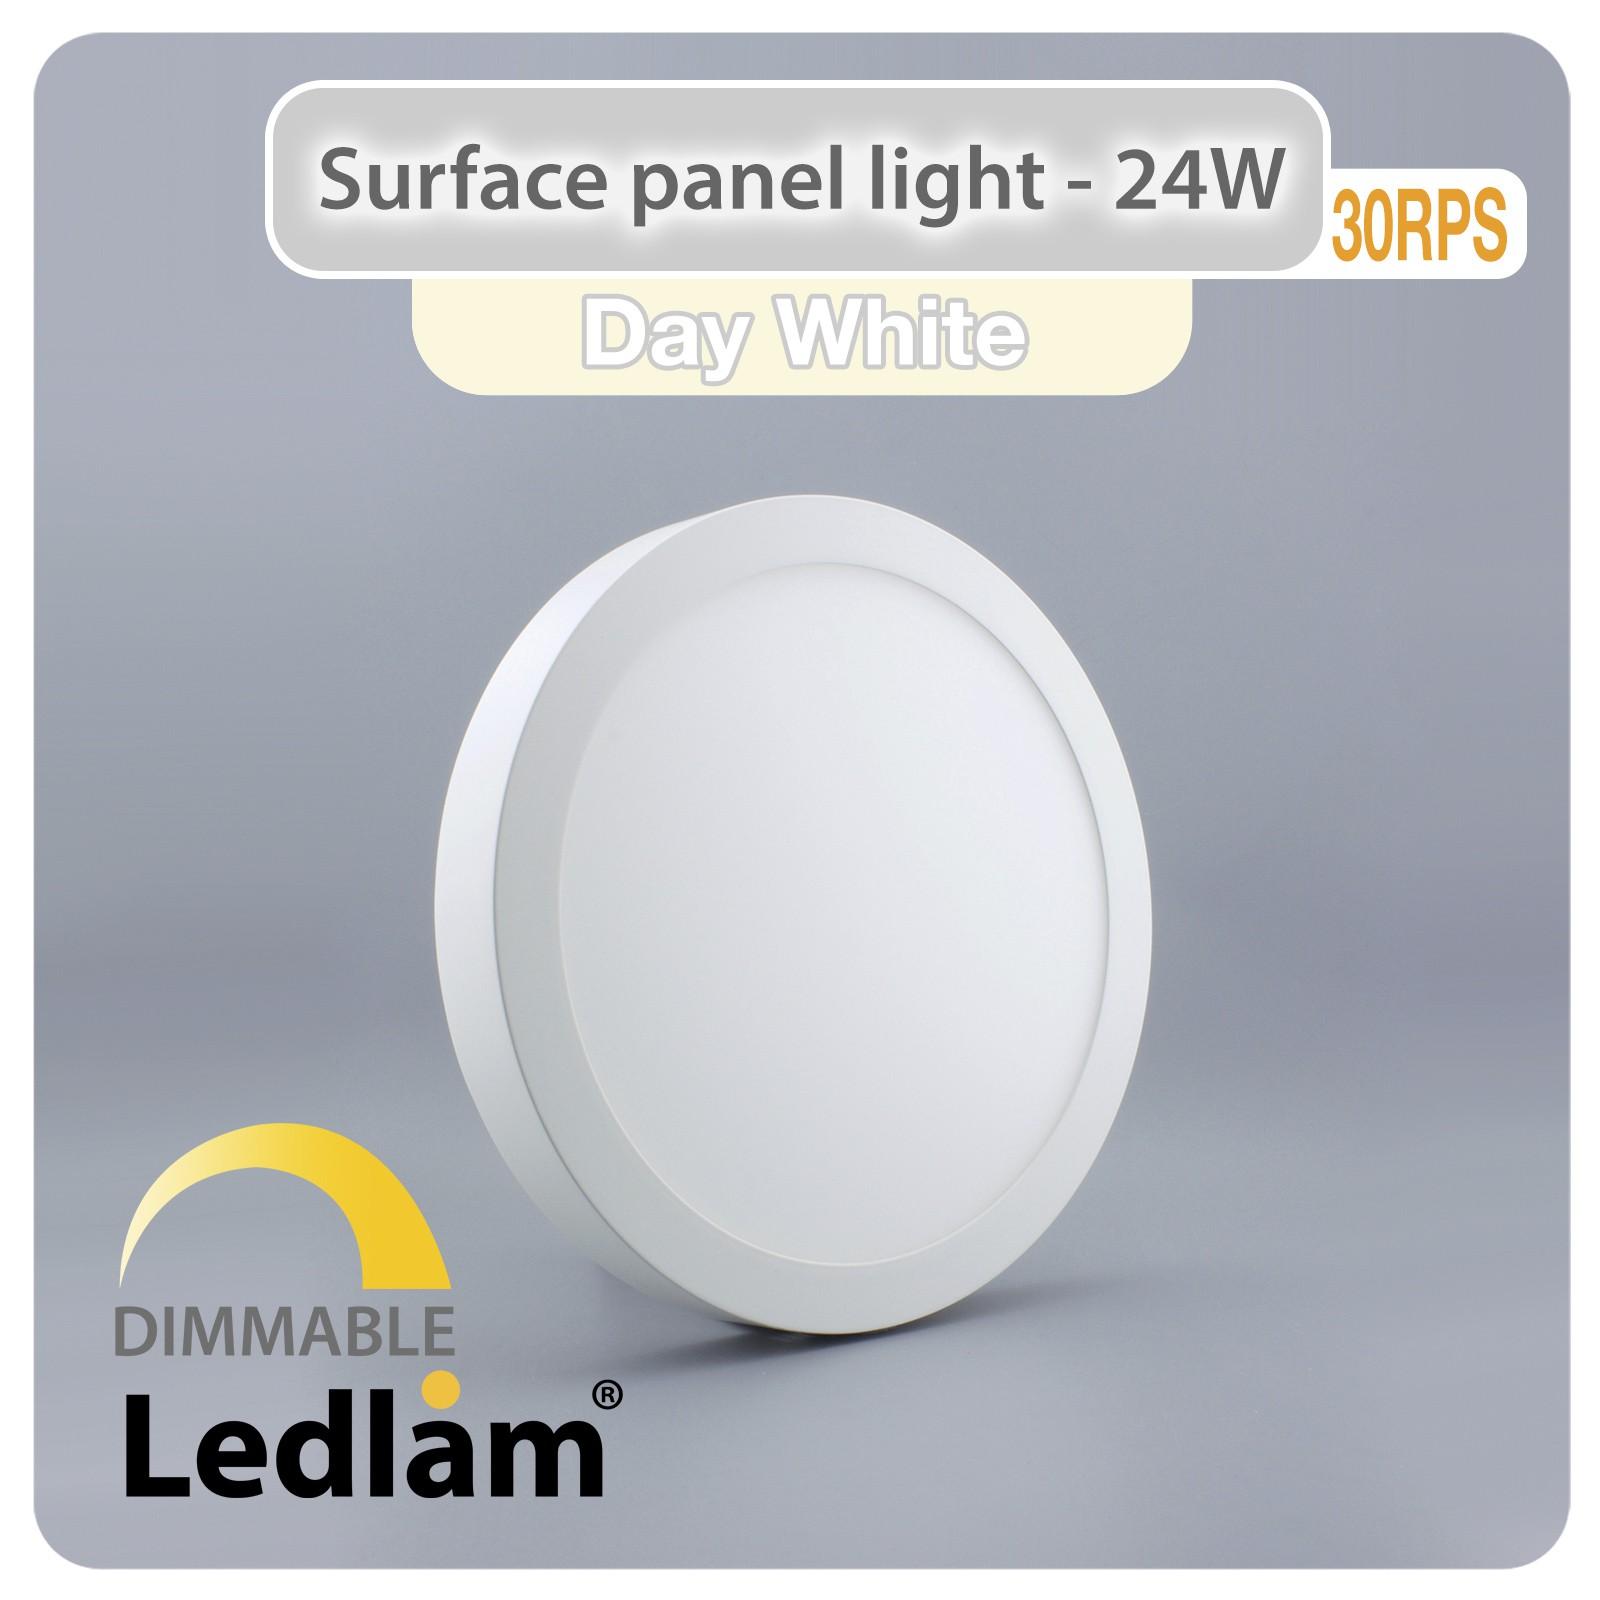 led deckenleuchte wei 24 watt rund 30cm neutralwei dimmbar mit led dimmer. Black Bedroom Furniture Sets. Home Design Ideas